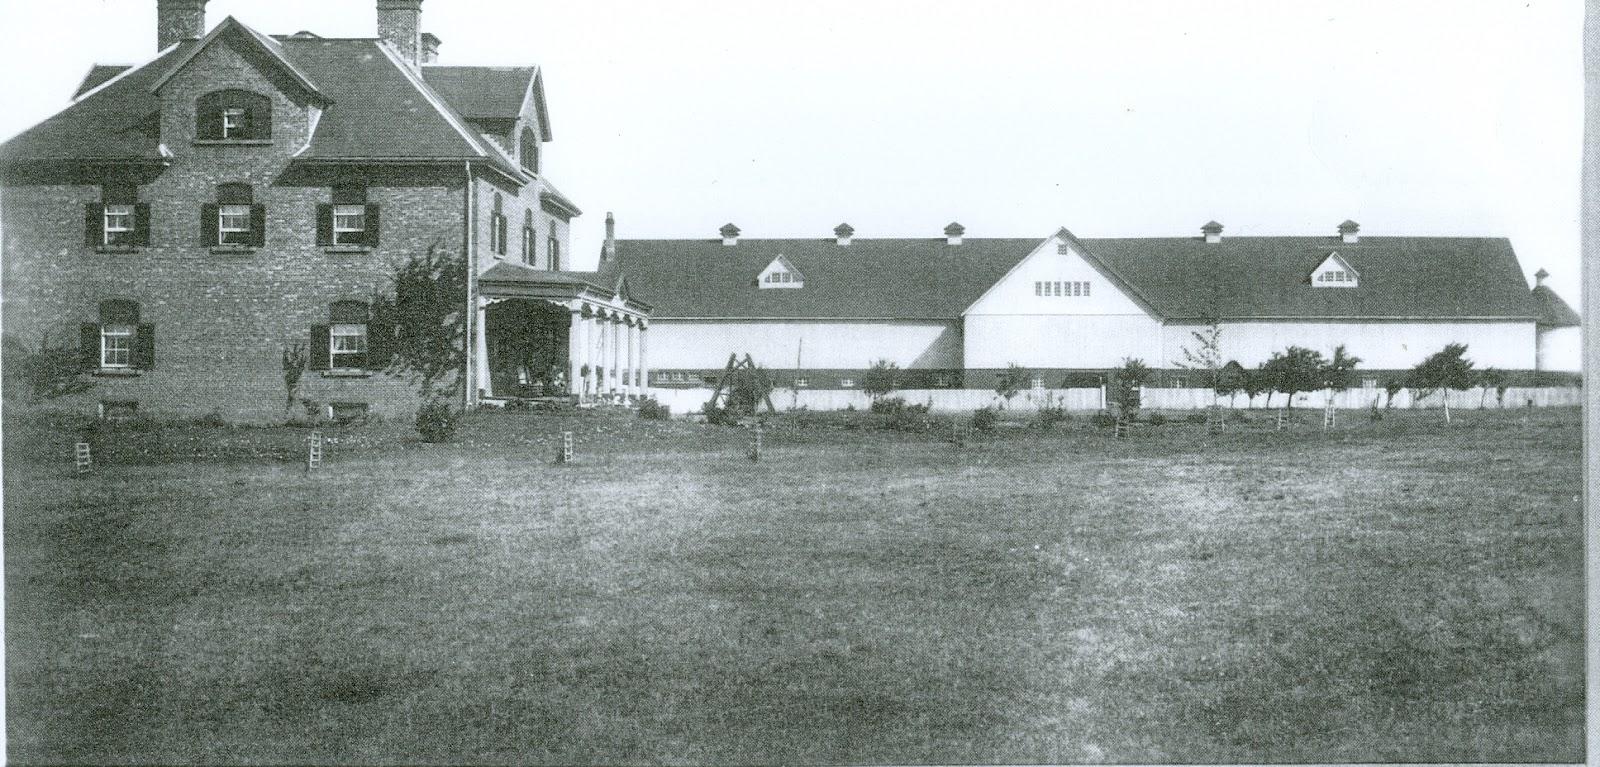 P E I Heritage Buildings Save Glenaladale Estate 1883 1884